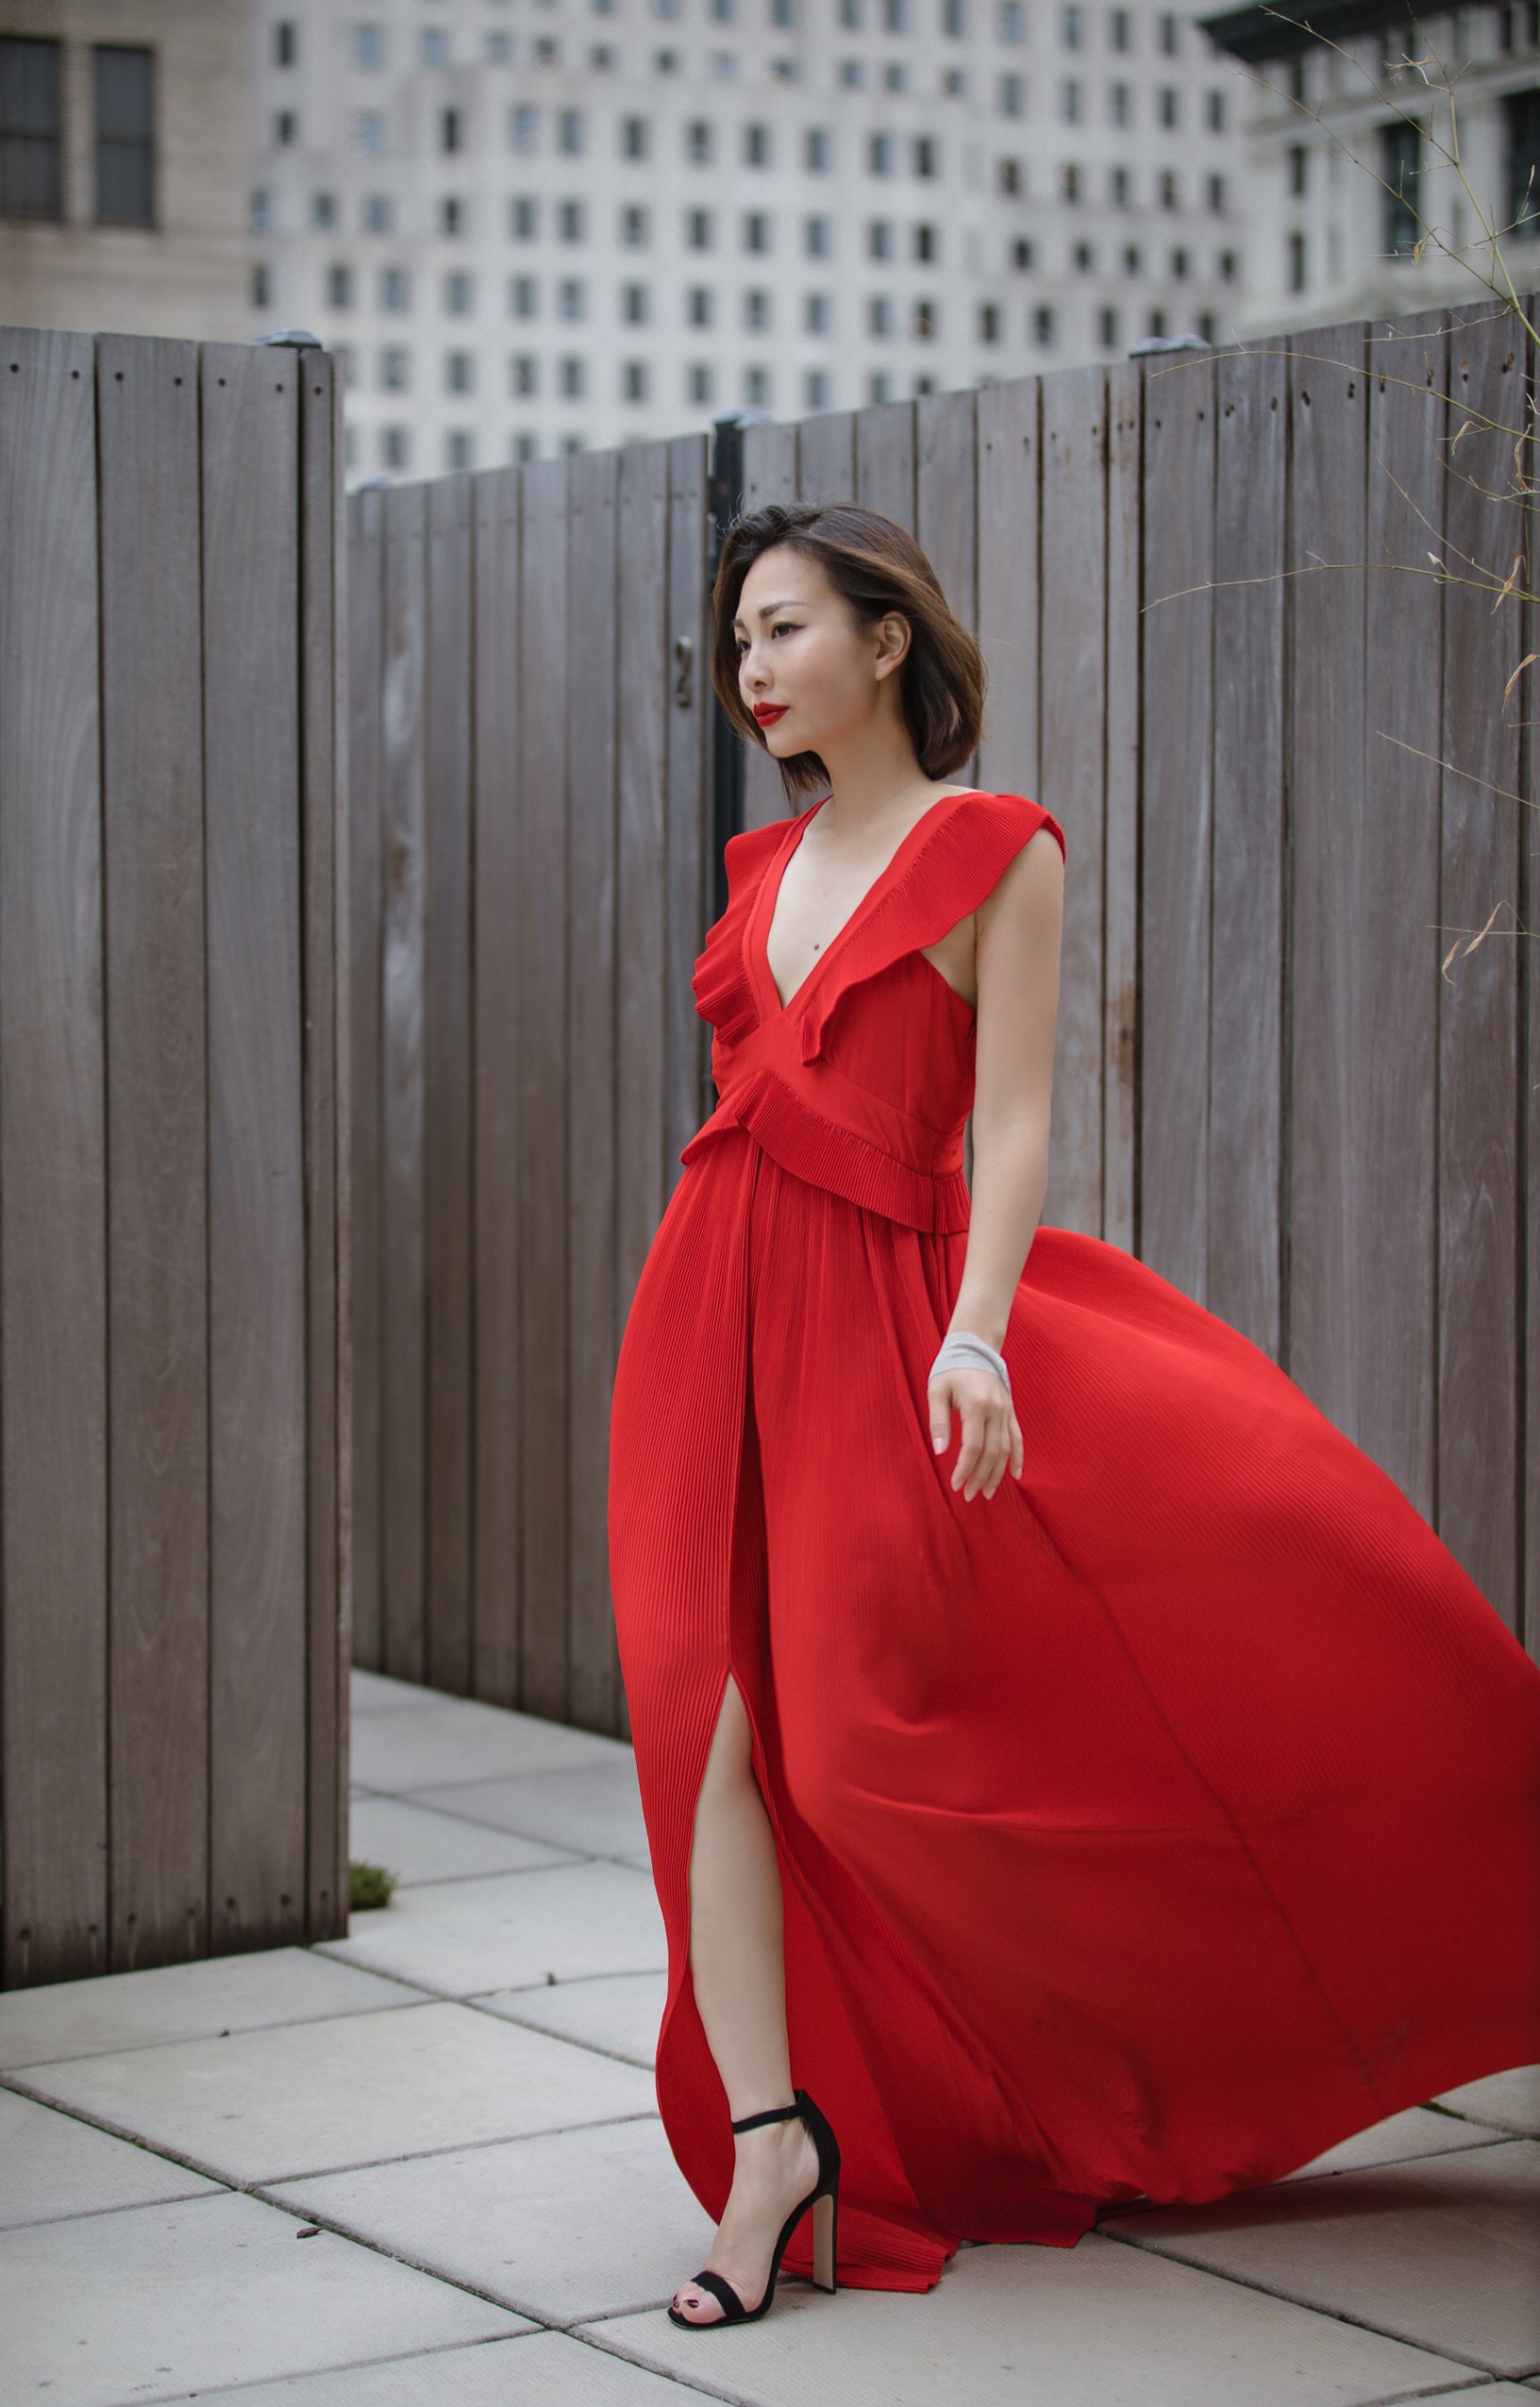 chelsea and walker red dress 1.JPG